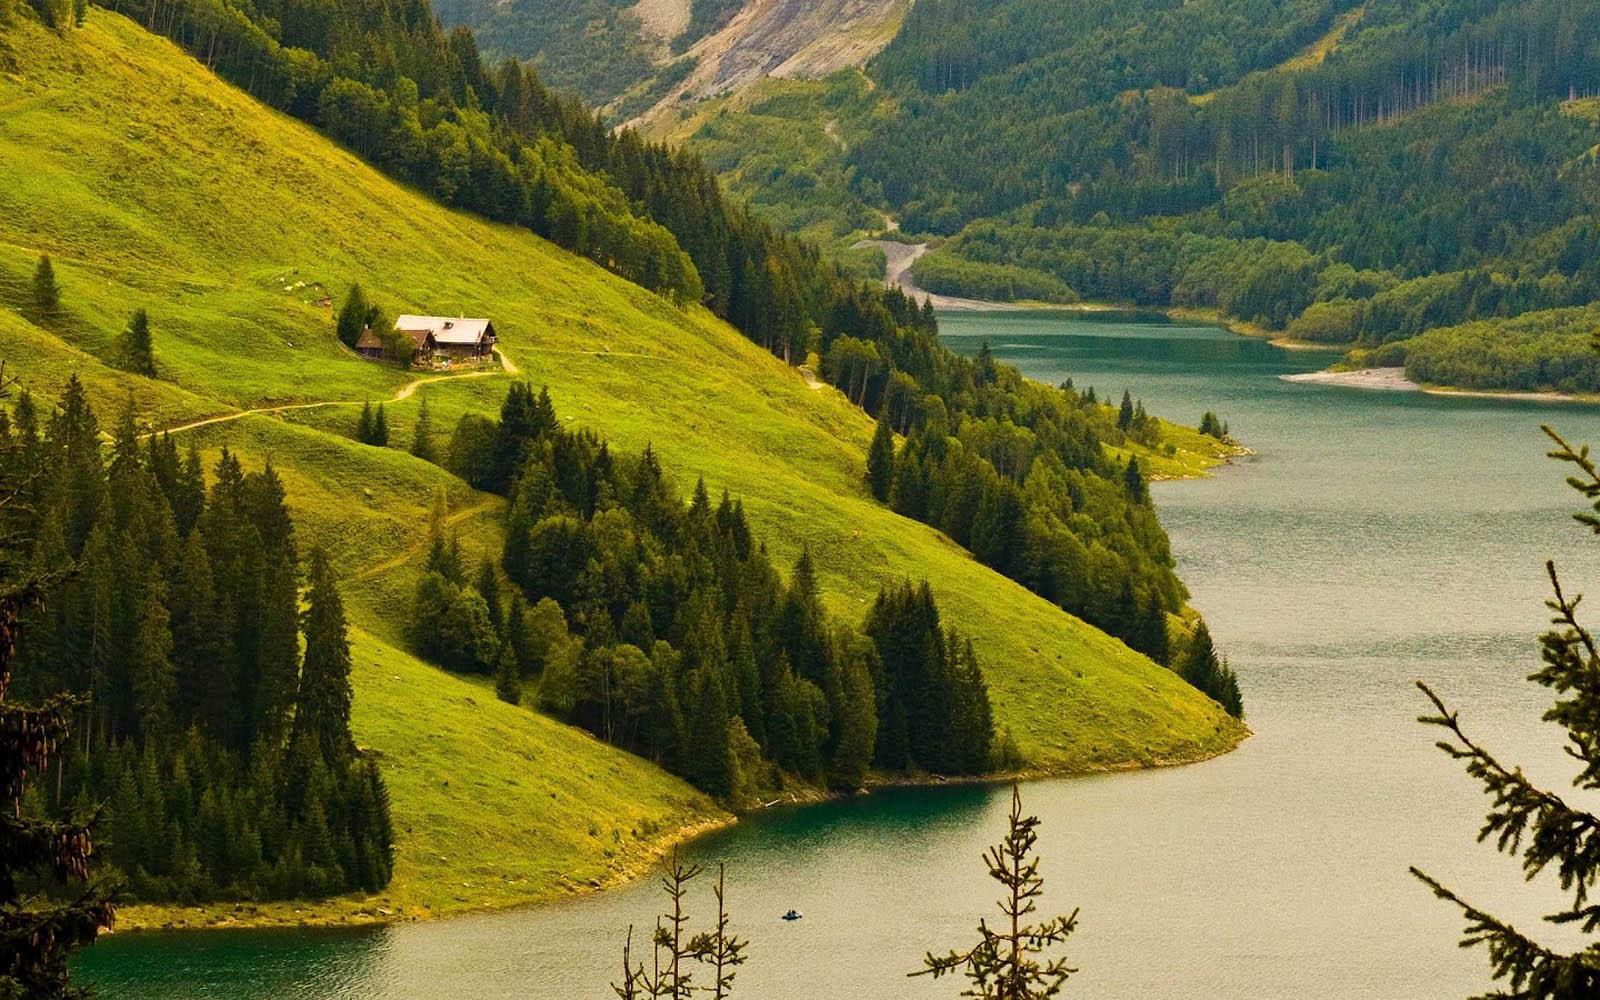 Gambar Gambar Pemandangan Alam Indah Kumpulan Gambar